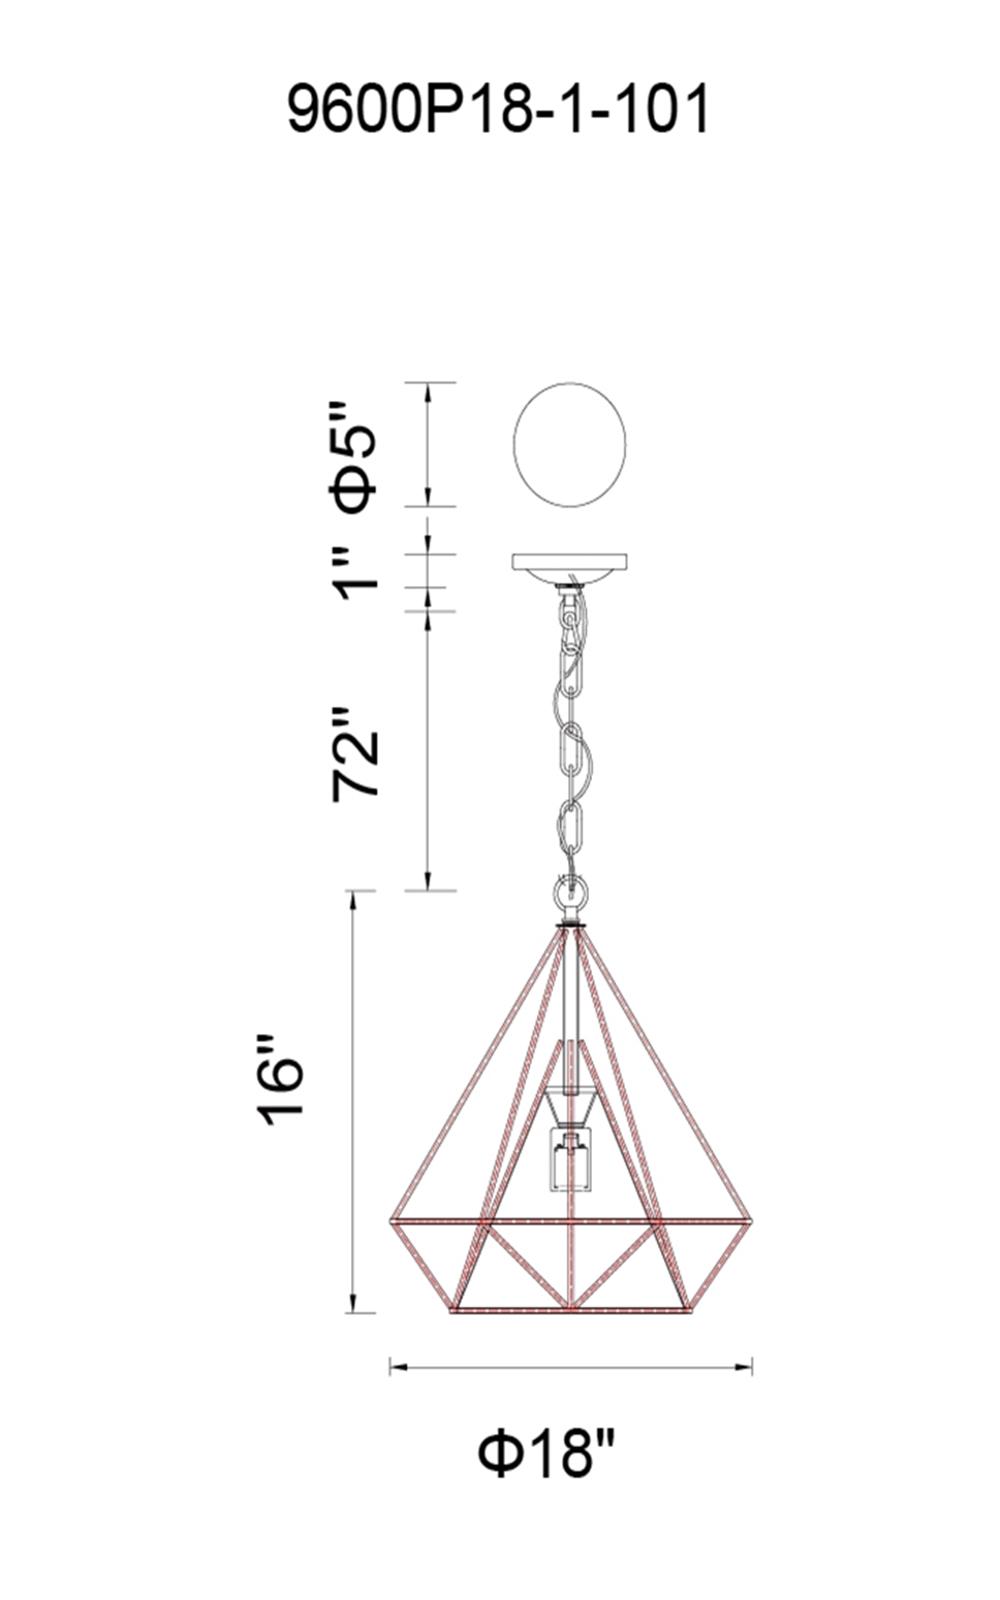 CWI Lighting Diamond 1 Light Down Pendant With Black Finish Model: 9600P18-1-101 Line Drawing